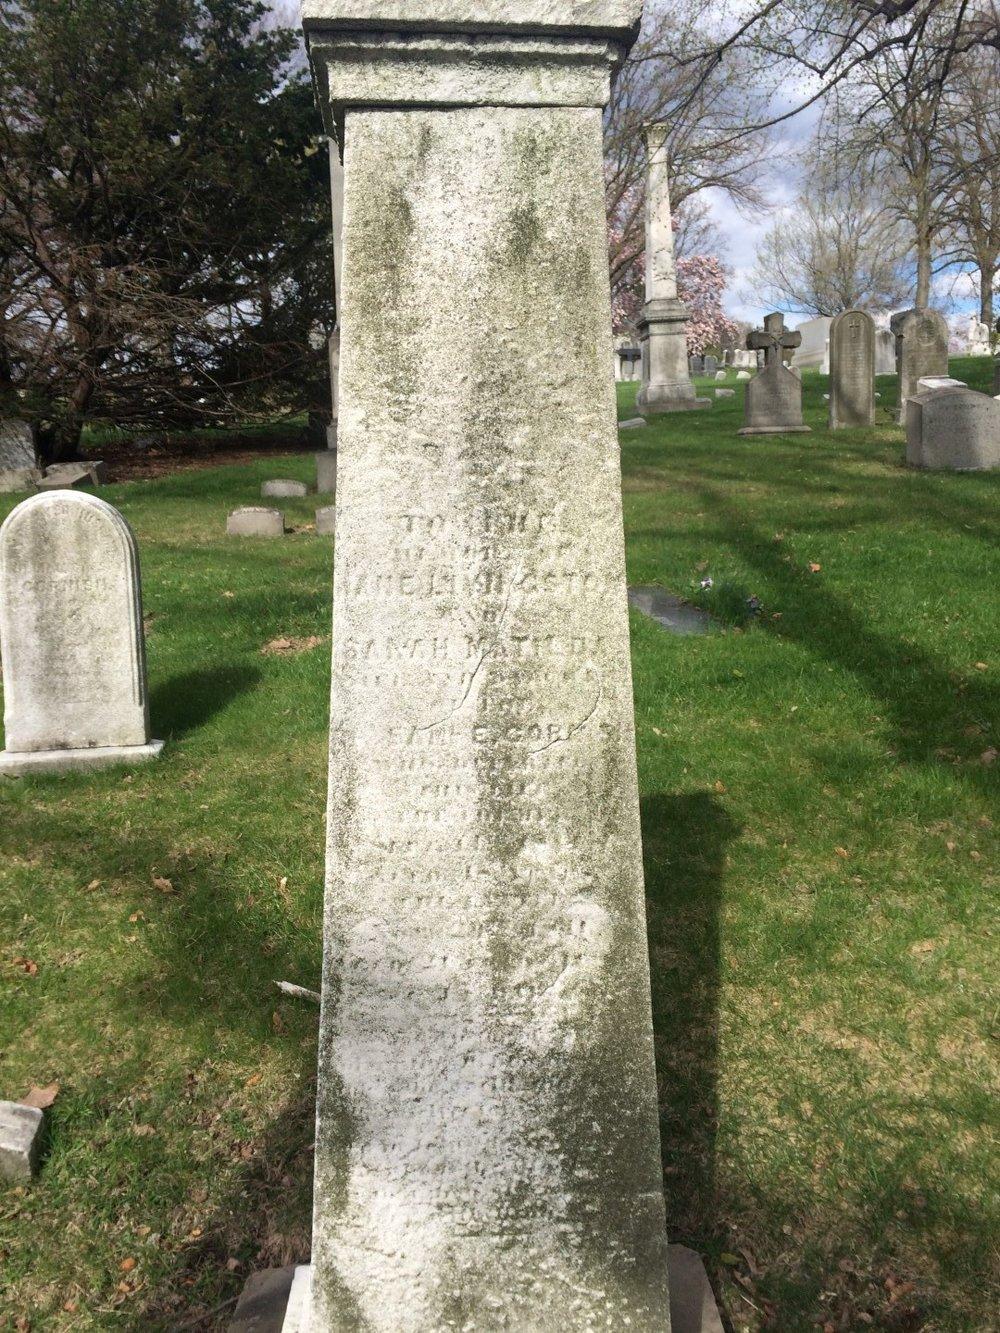 Samuel Eli Cornish is buried at Green-Wood Cemetery, Brooklyn, New York.